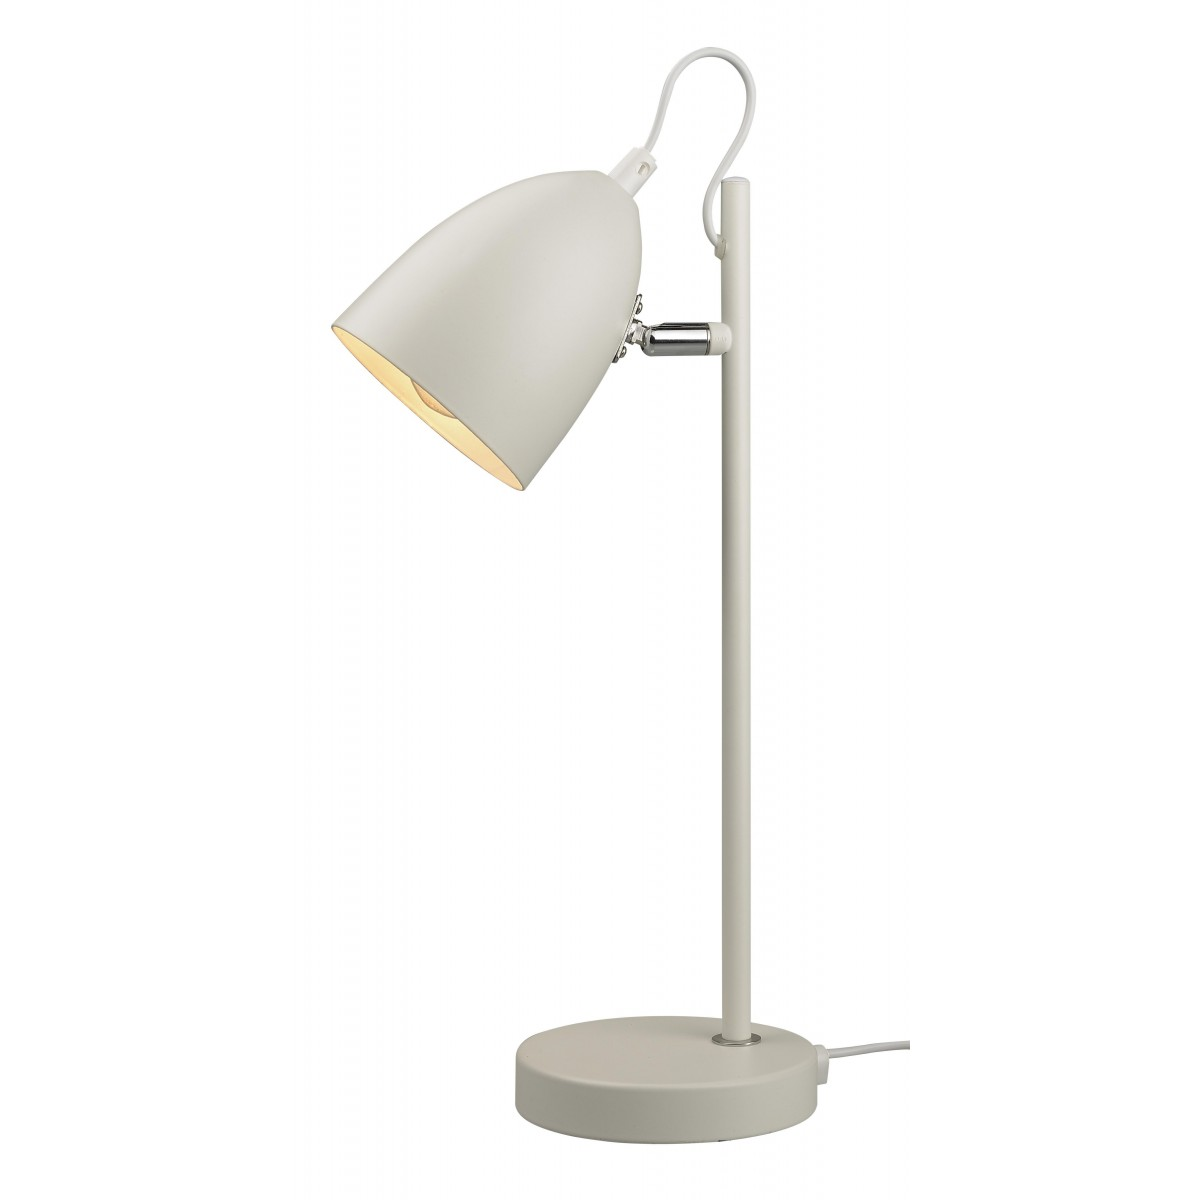 HALO DESIGN Bordlampe yep - hvid